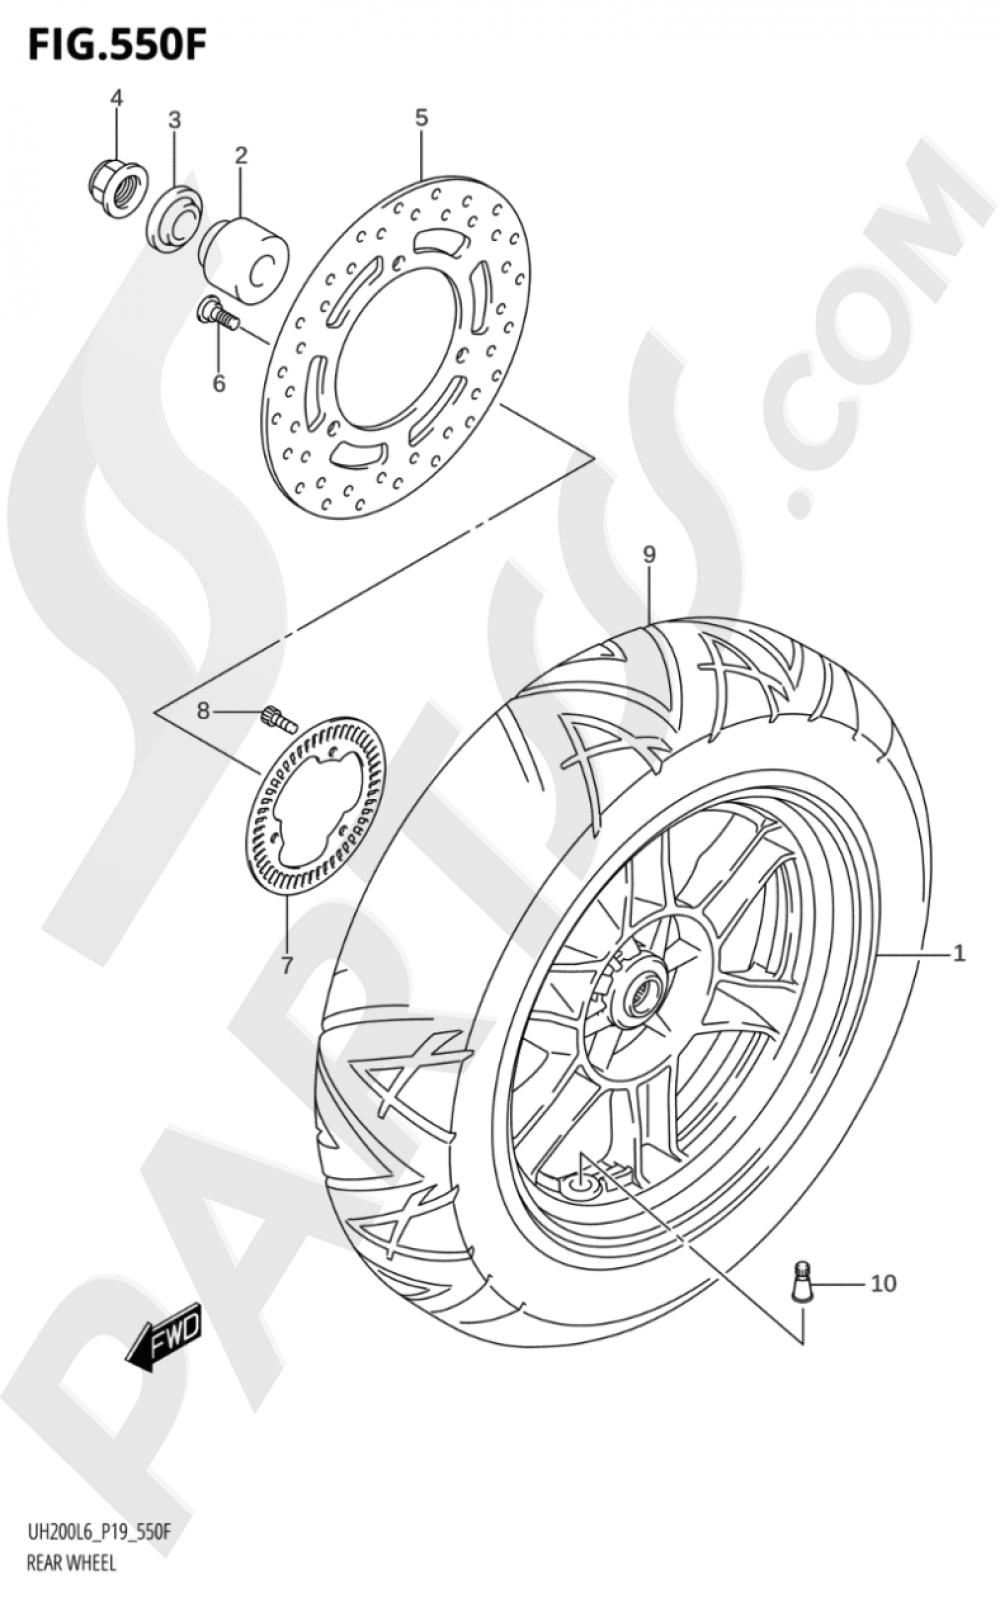 550F - REAR WHEEL (UH200AL6 P53) Suzuki BURGMAN UH200A 2016